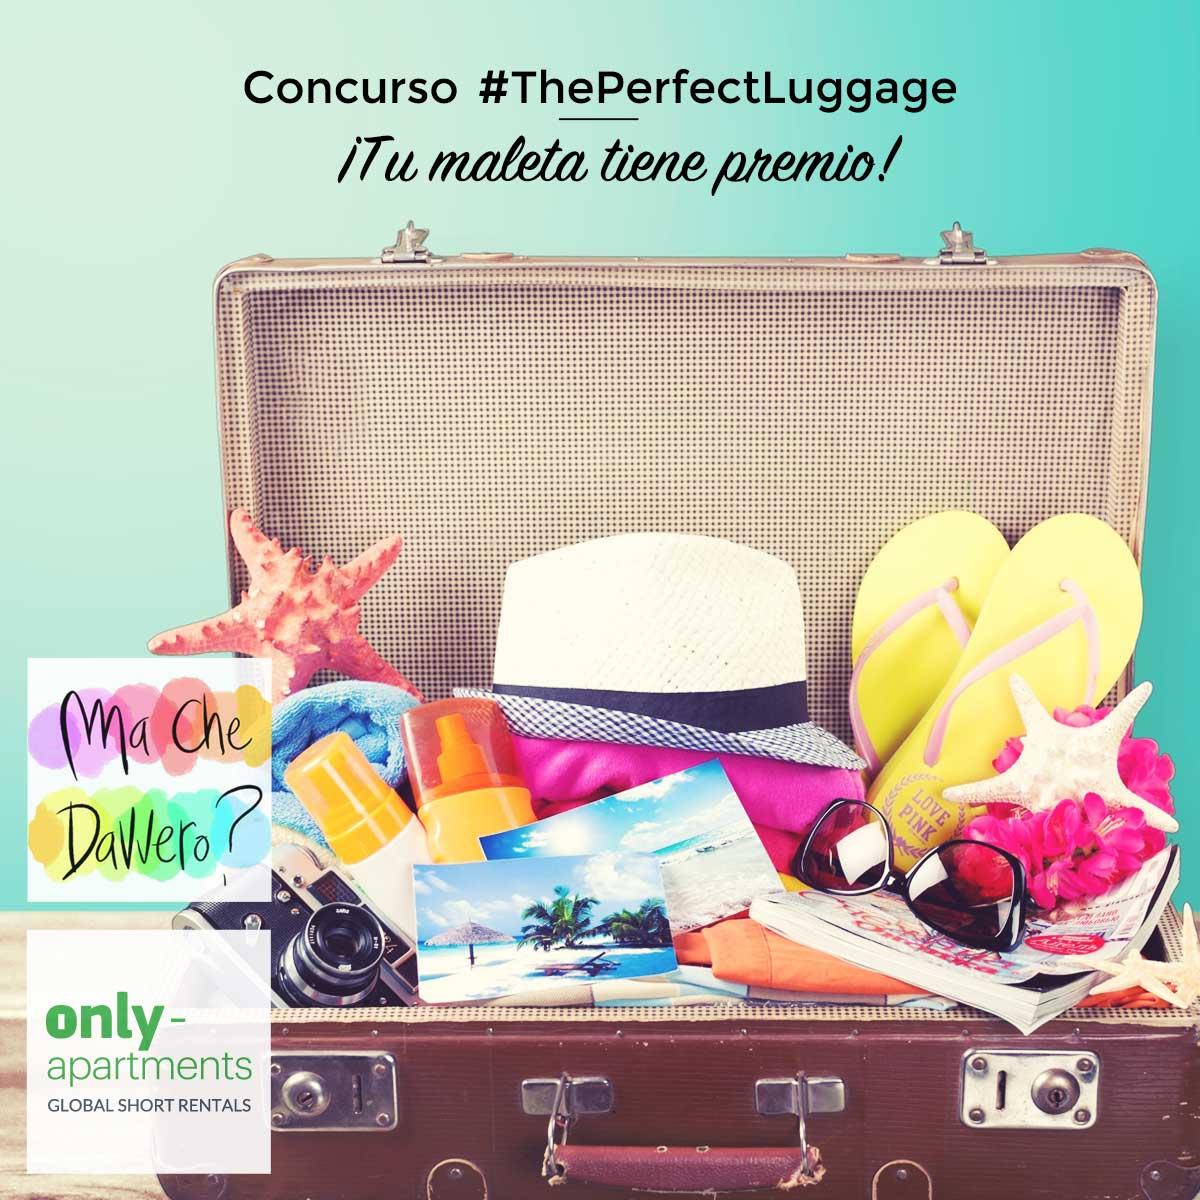 Concurso #ThePerfectLuggage